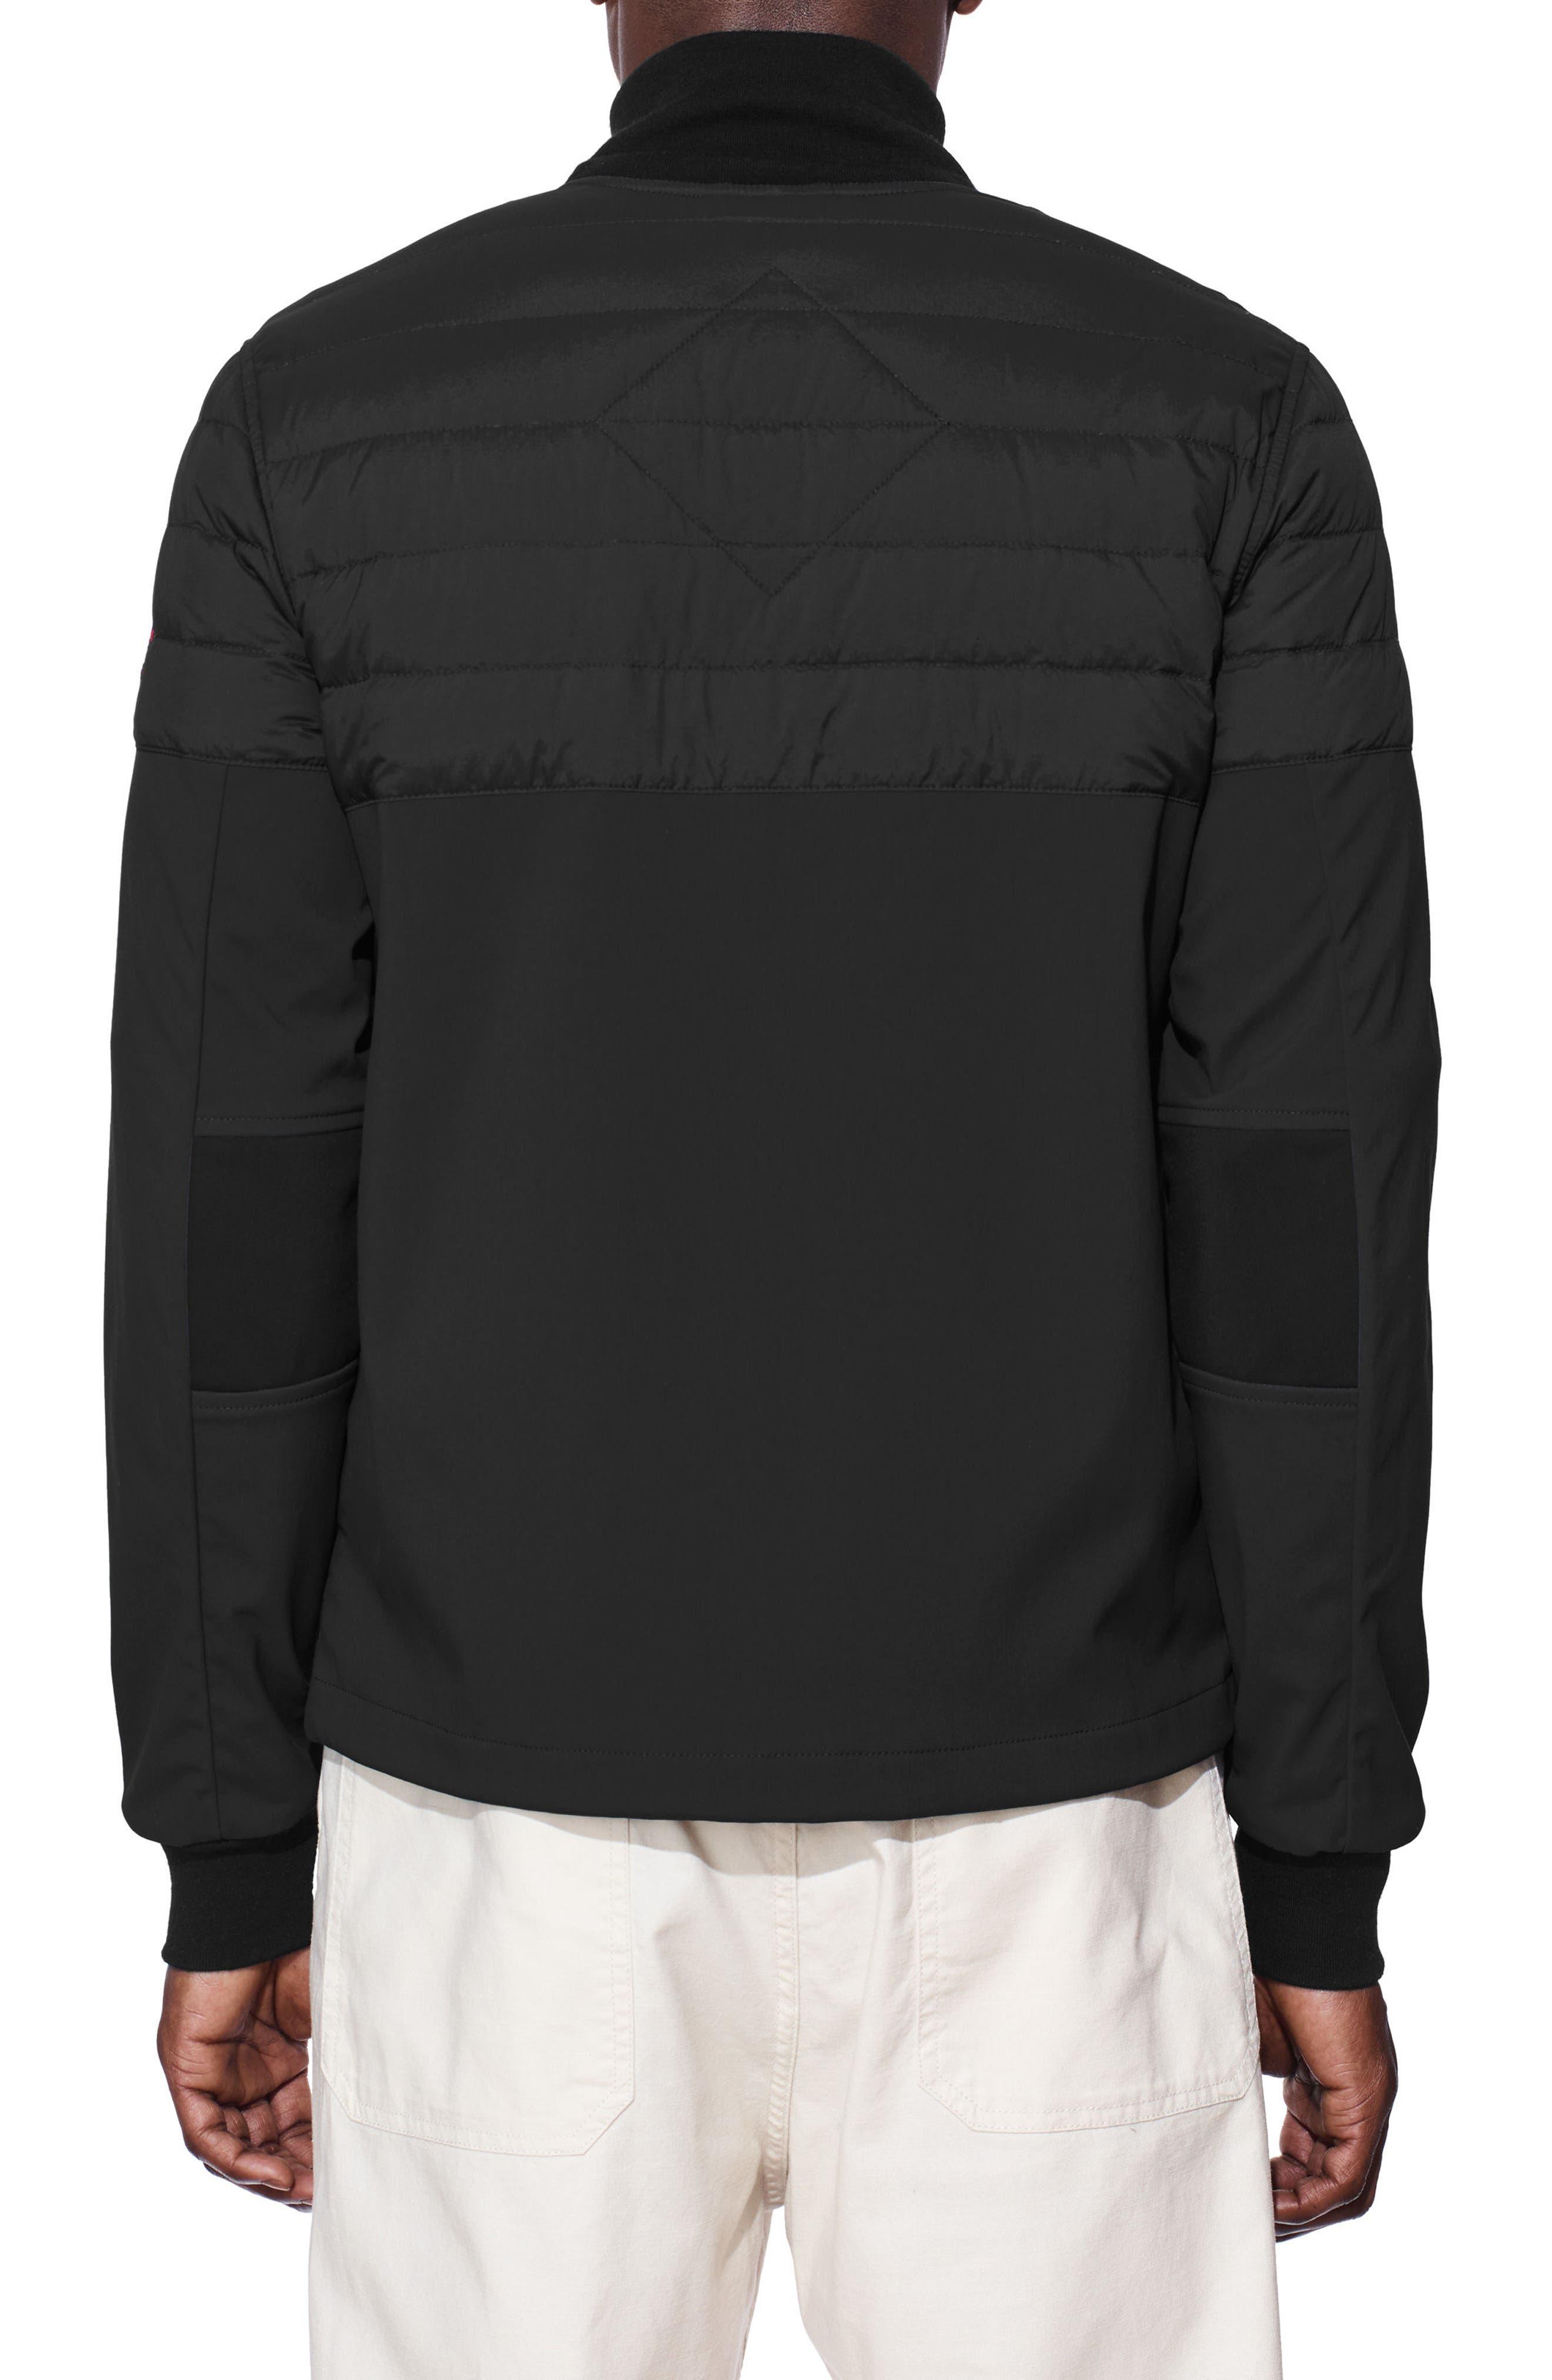 Canade Goose Jericho Beach Down Filled Jacket,                             Alternate thumbnail 2, color,                             Black/ Black